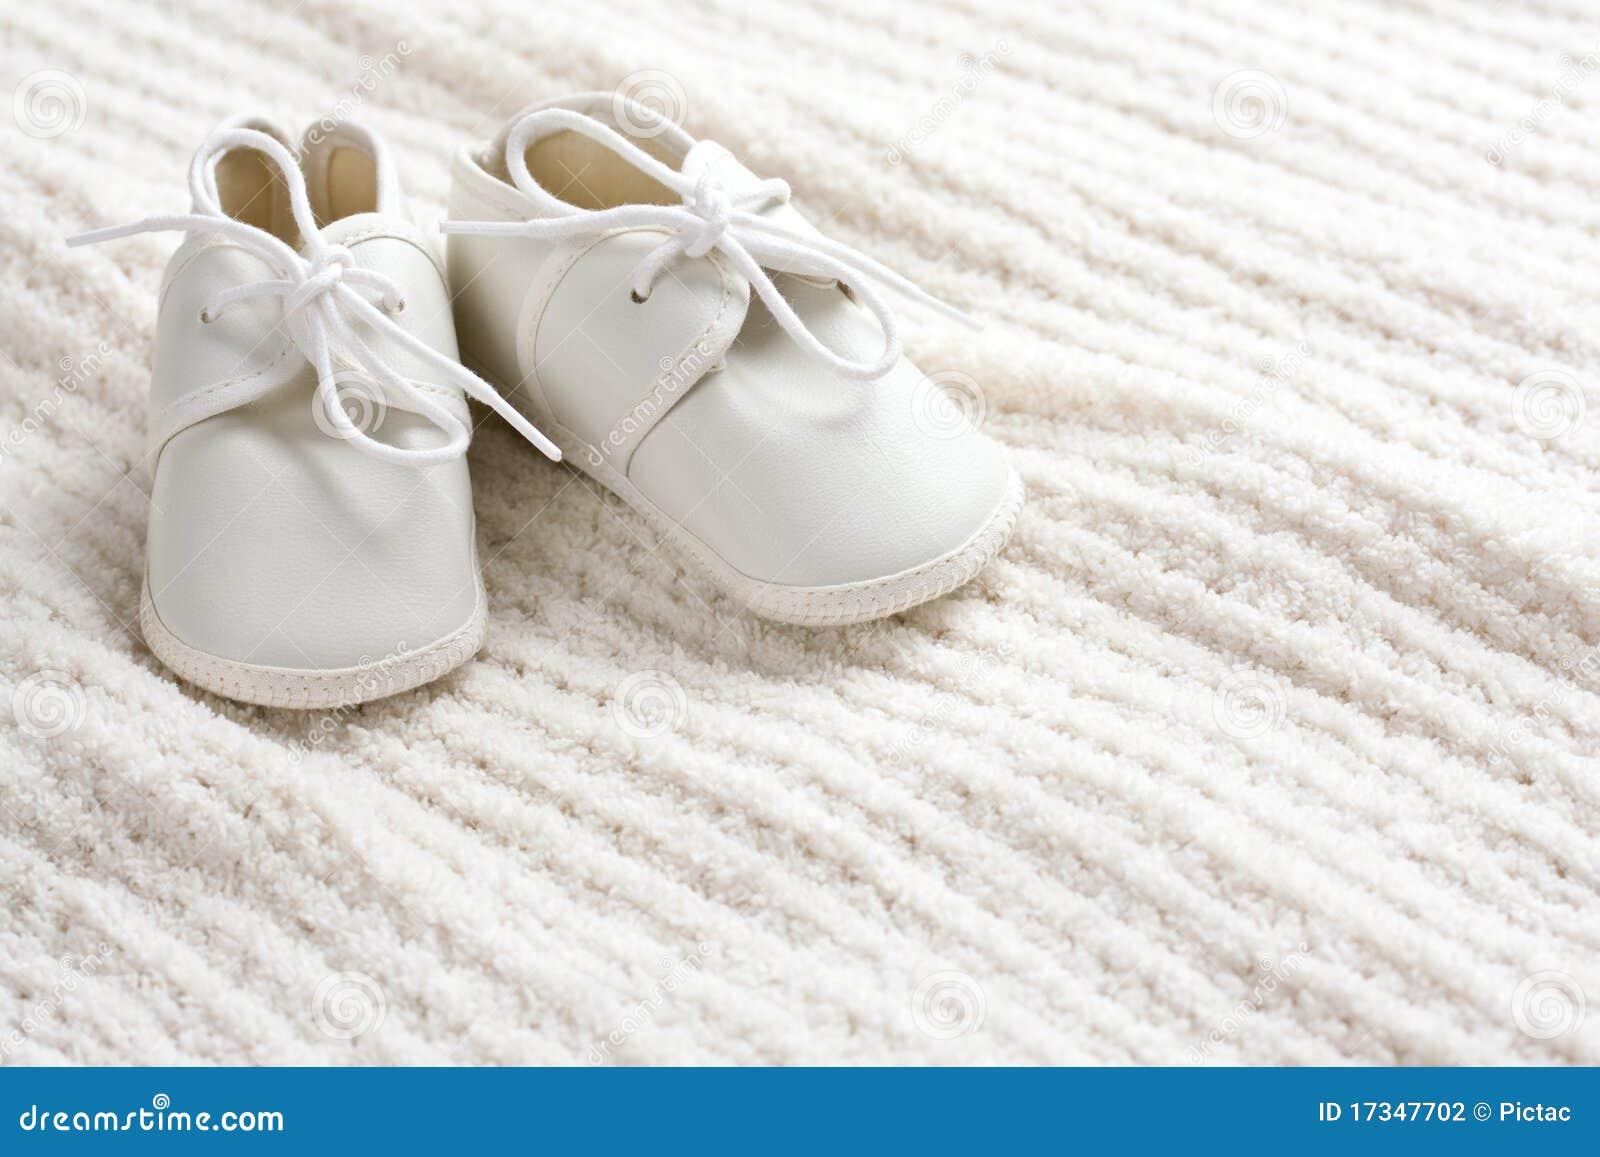 Toddler Boy Dress Shoes